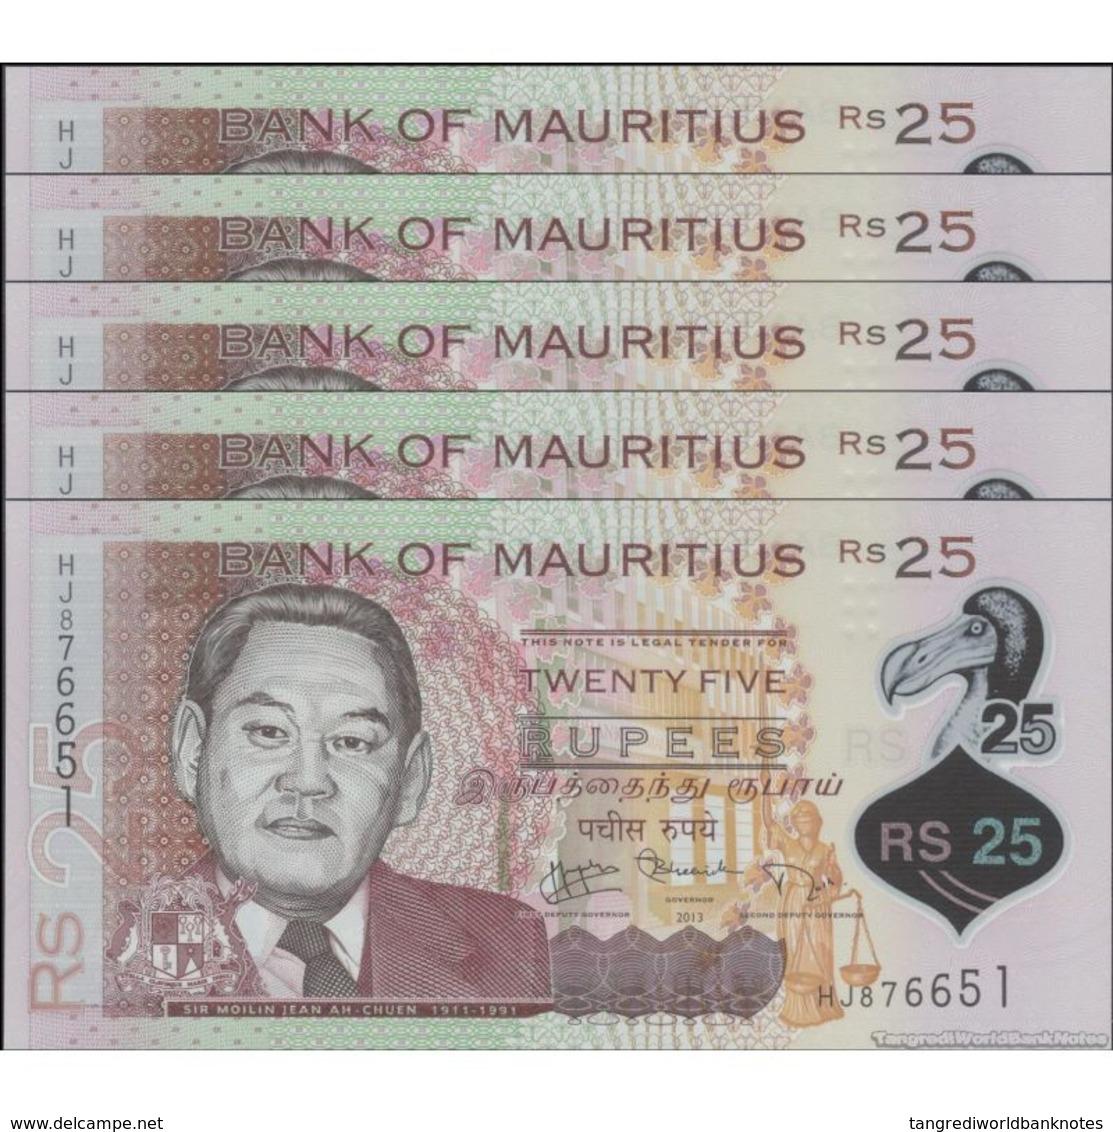 TWN - MAURITIUS 64 - 25 Rupees 2013 DEALERS LOT X 5 - Polymer - Prefix HJ UNC - Maurice